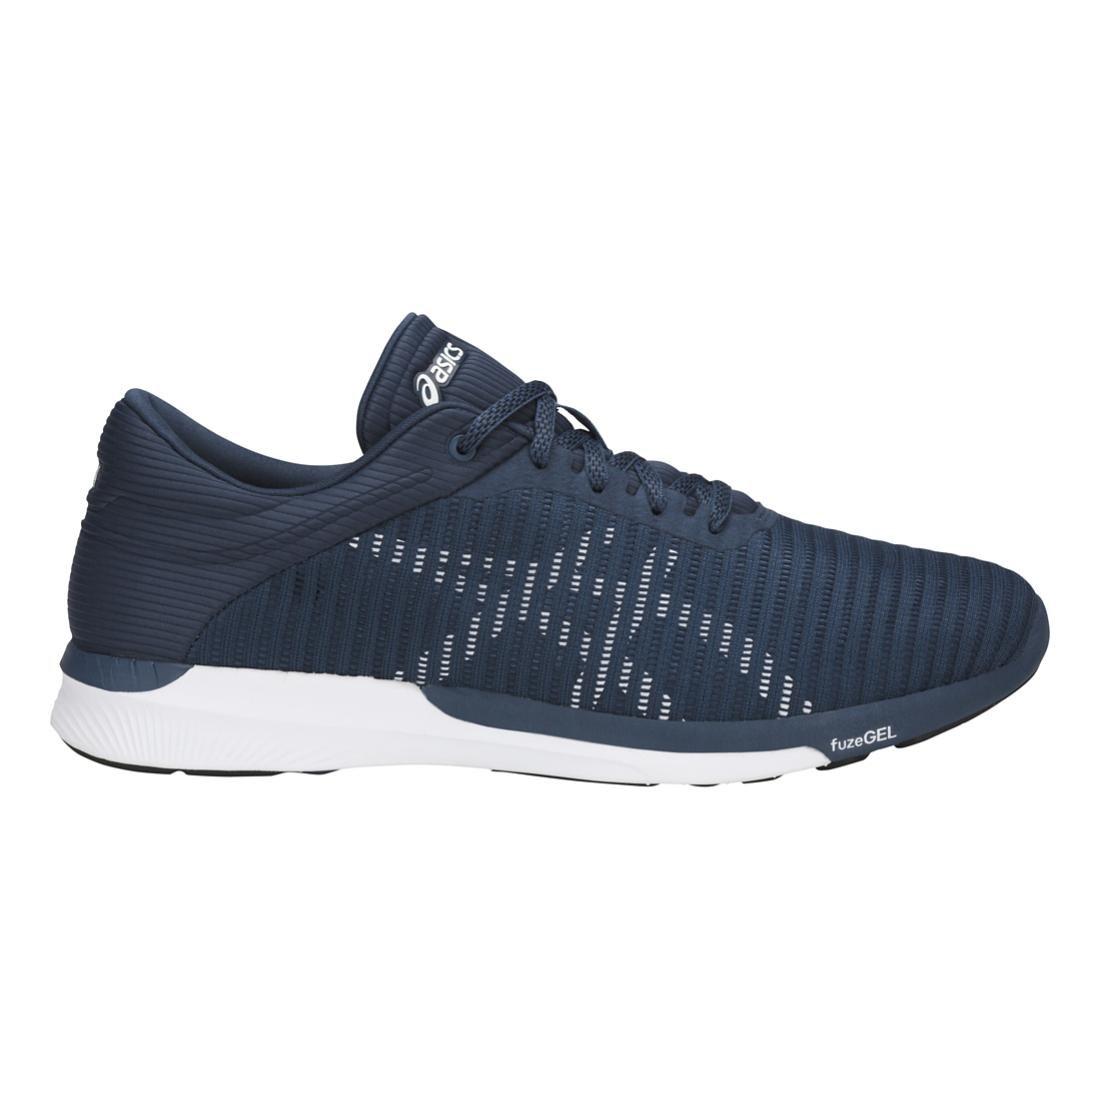 ASICS Fuzex Rush Adapt Men's Running B071VTNK3R 7 D(M) US|Dark Blue/White/Smoke Blue